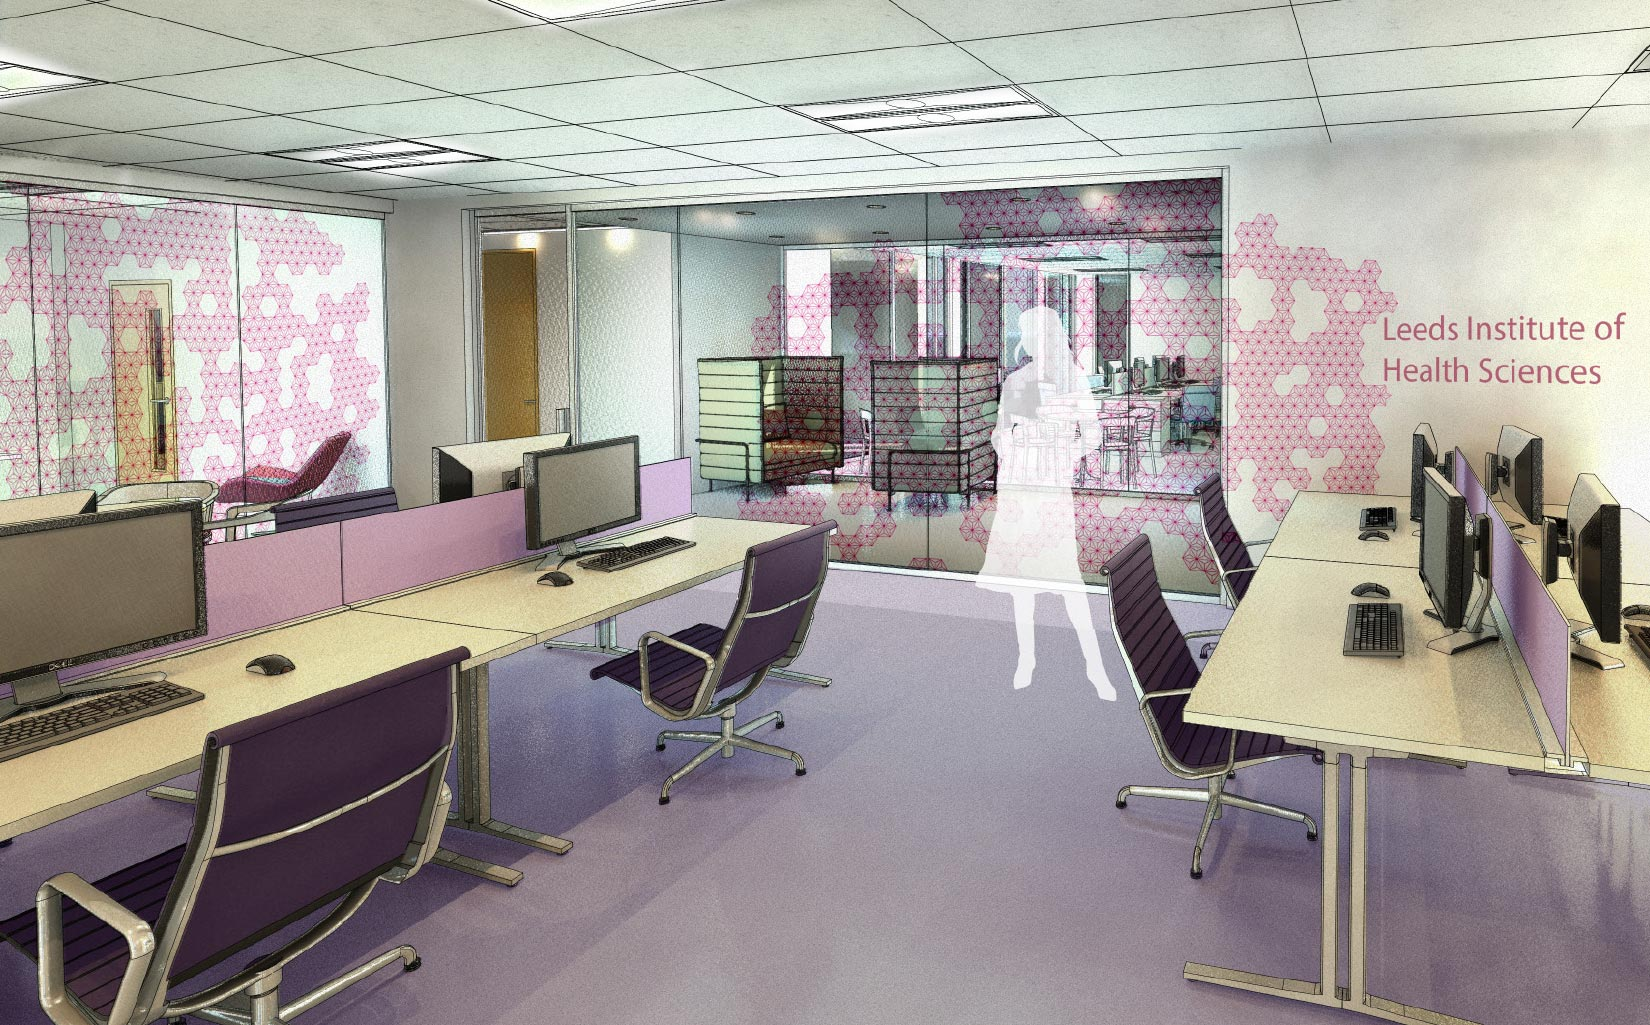 Worsley Building, University of Leeds, Concept Visual teaching space